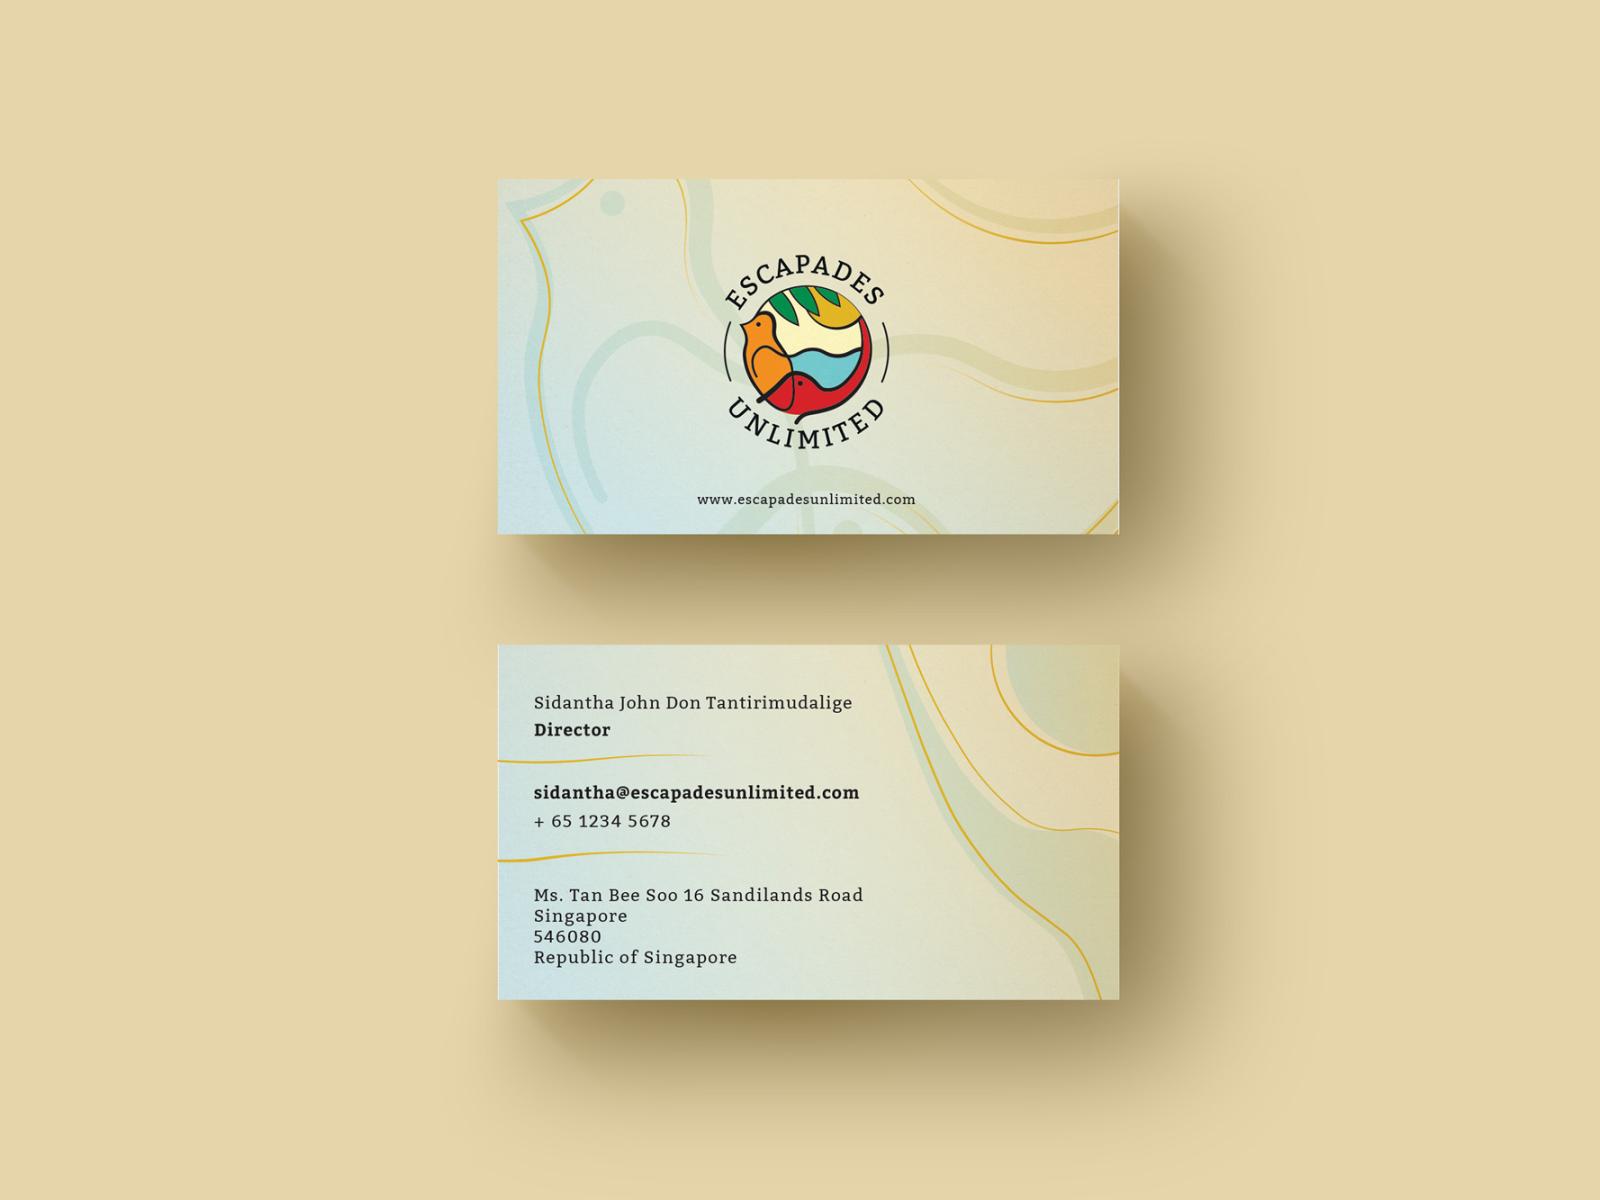 Escapadesunlimitedbusinesscard1